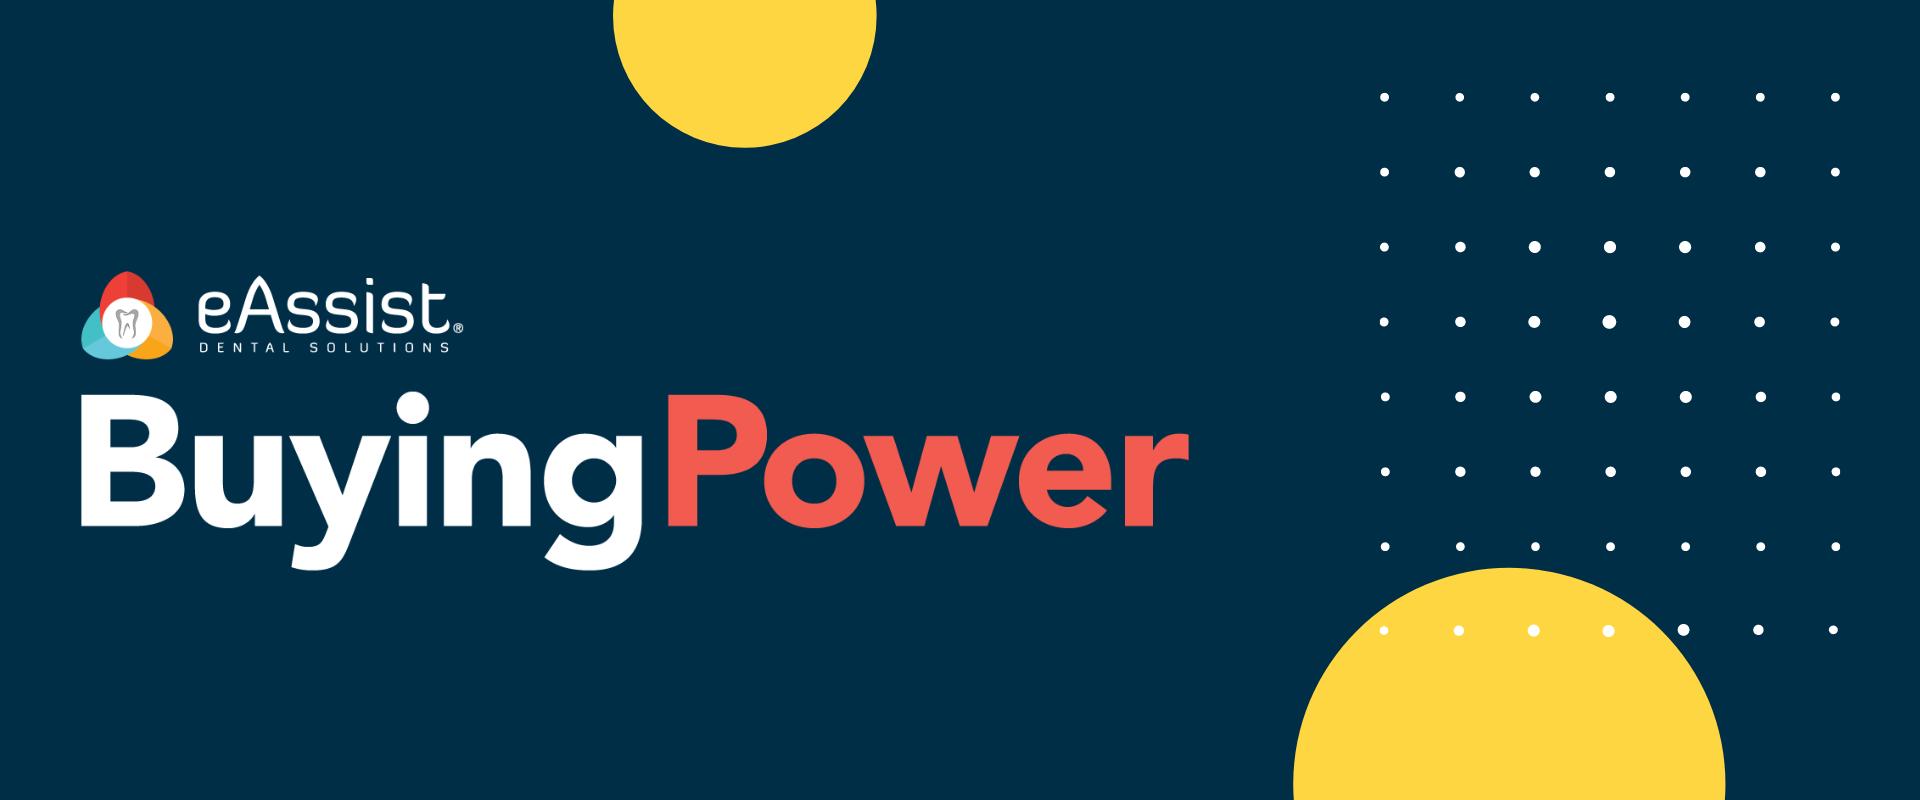 Buying Power Header Image